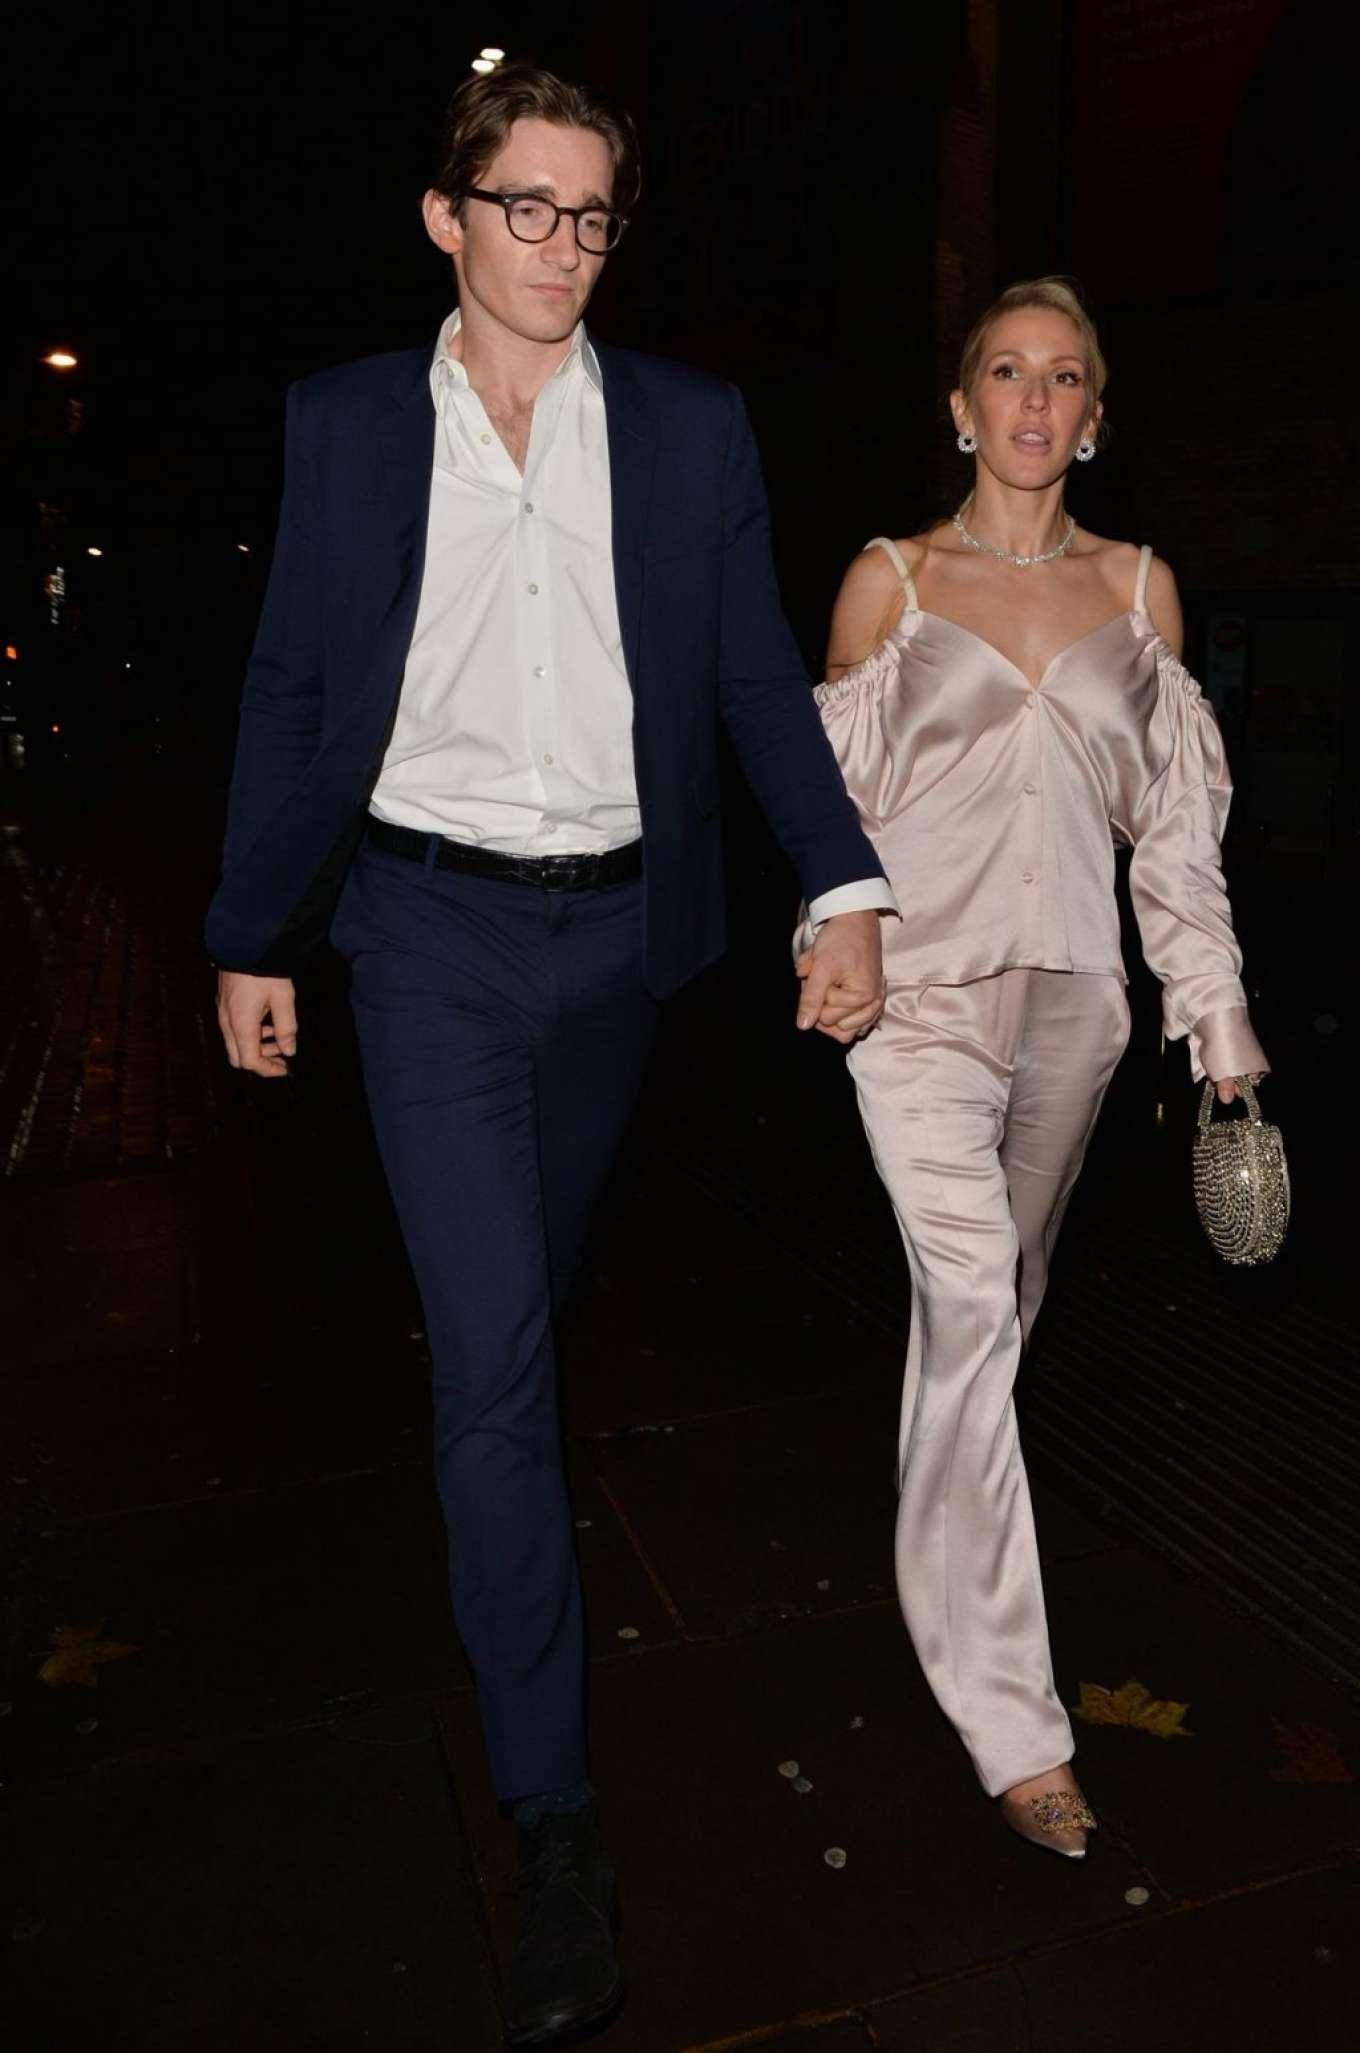 Ellie Goulding 2019 : Ellie Goulding and her husband Jaspar Copling were seen leaving the Roundhouse in Camden – London-20